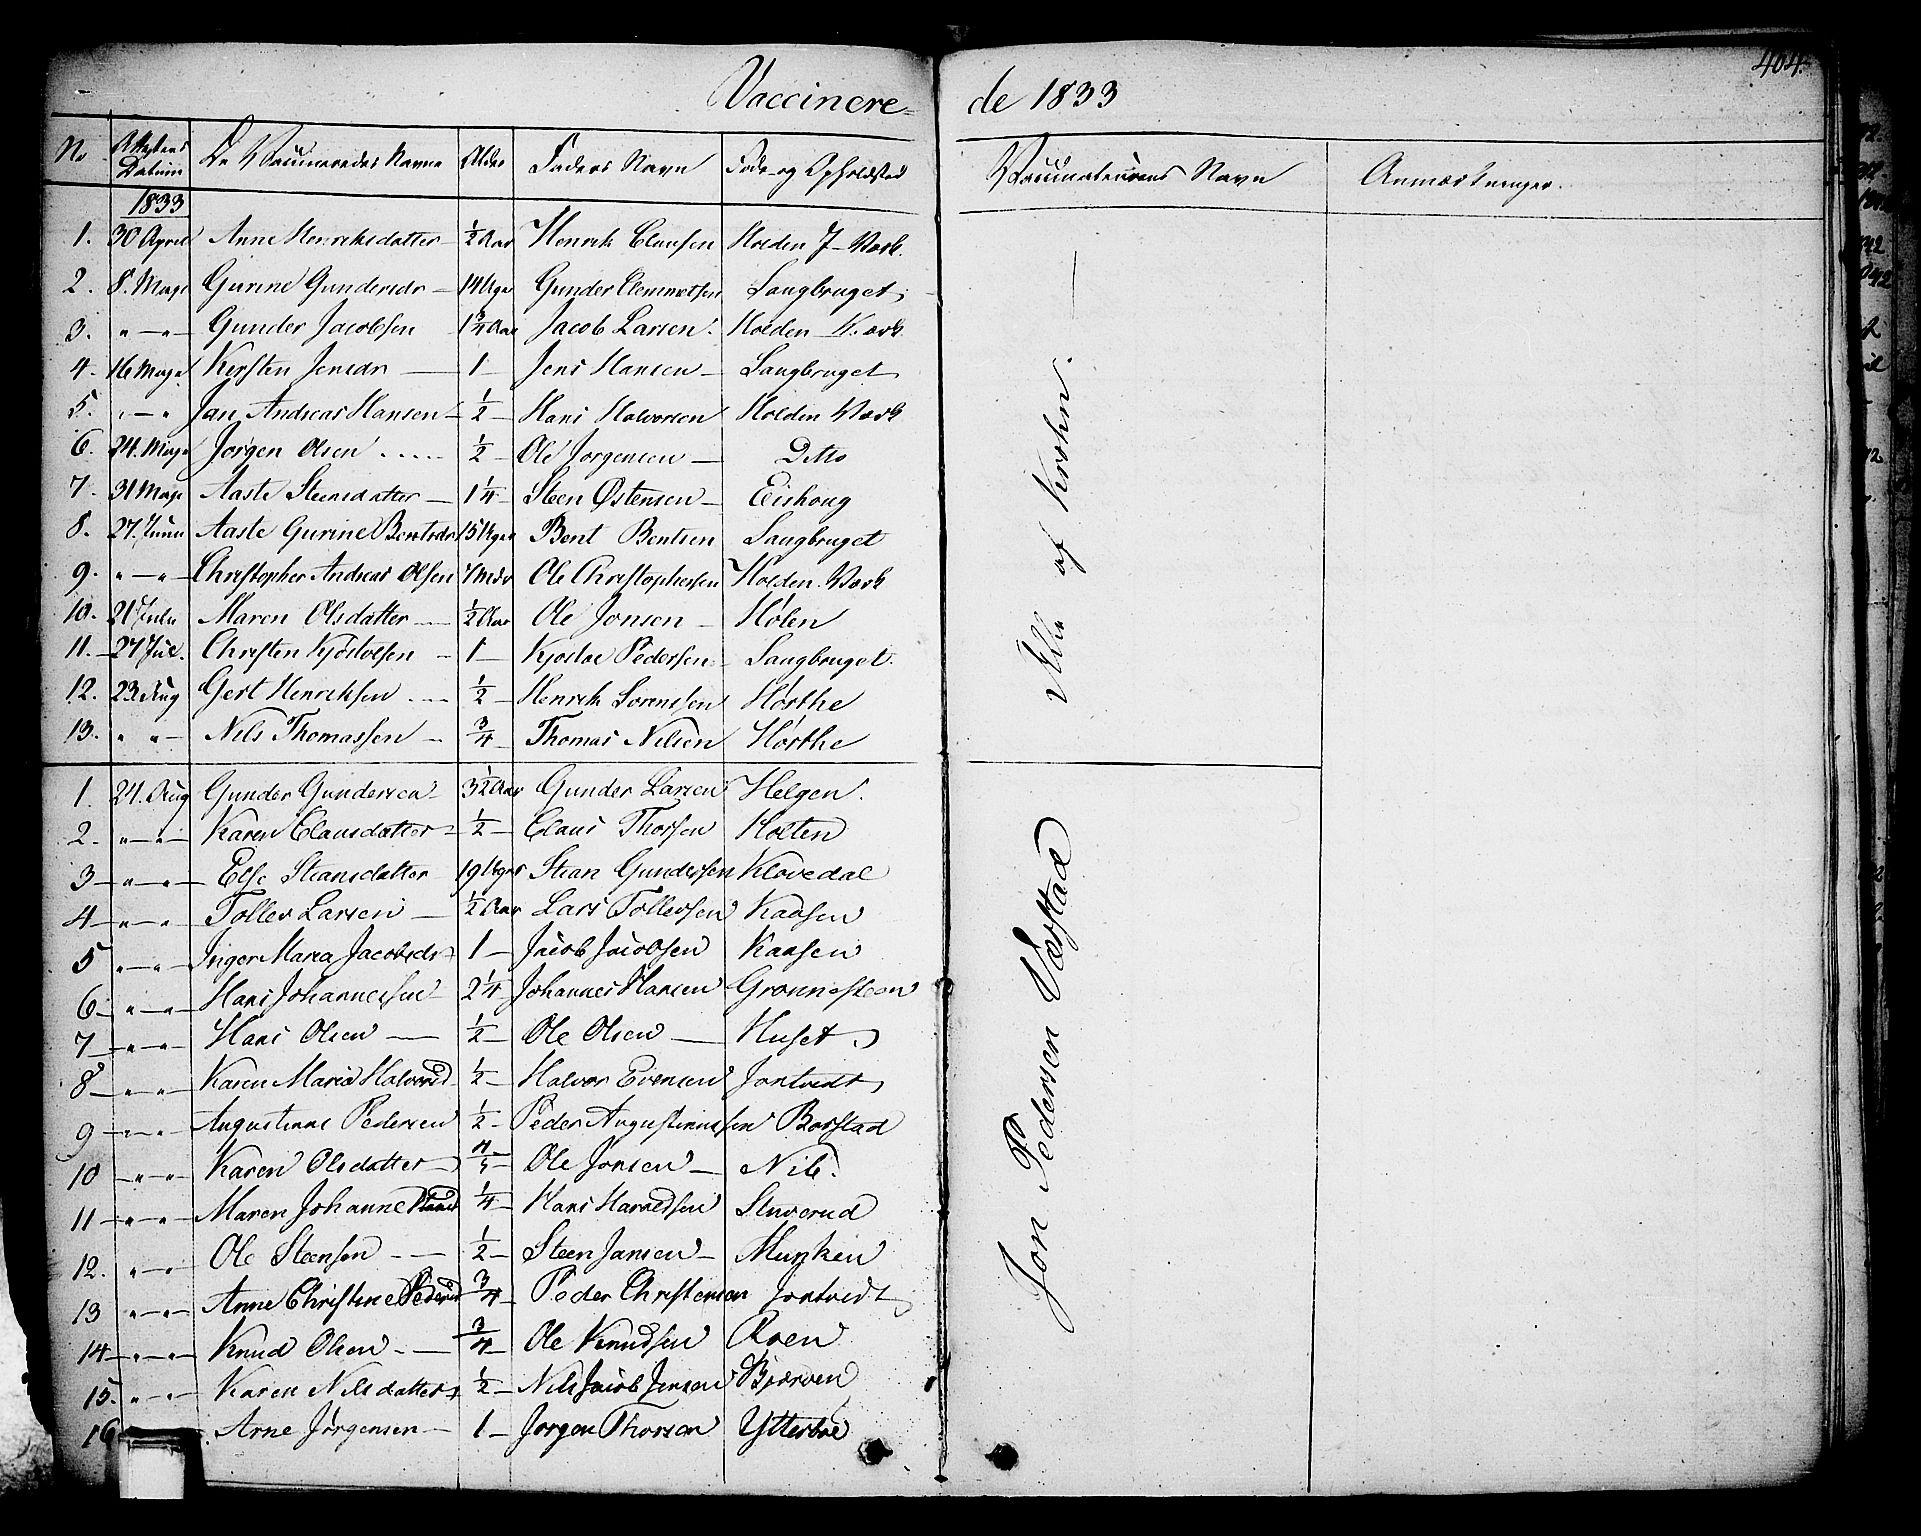 SAKO, Holla kirkebøker, F/Fa/L0004: Ministerialbok nr. 4, 1830-1848, s. 404